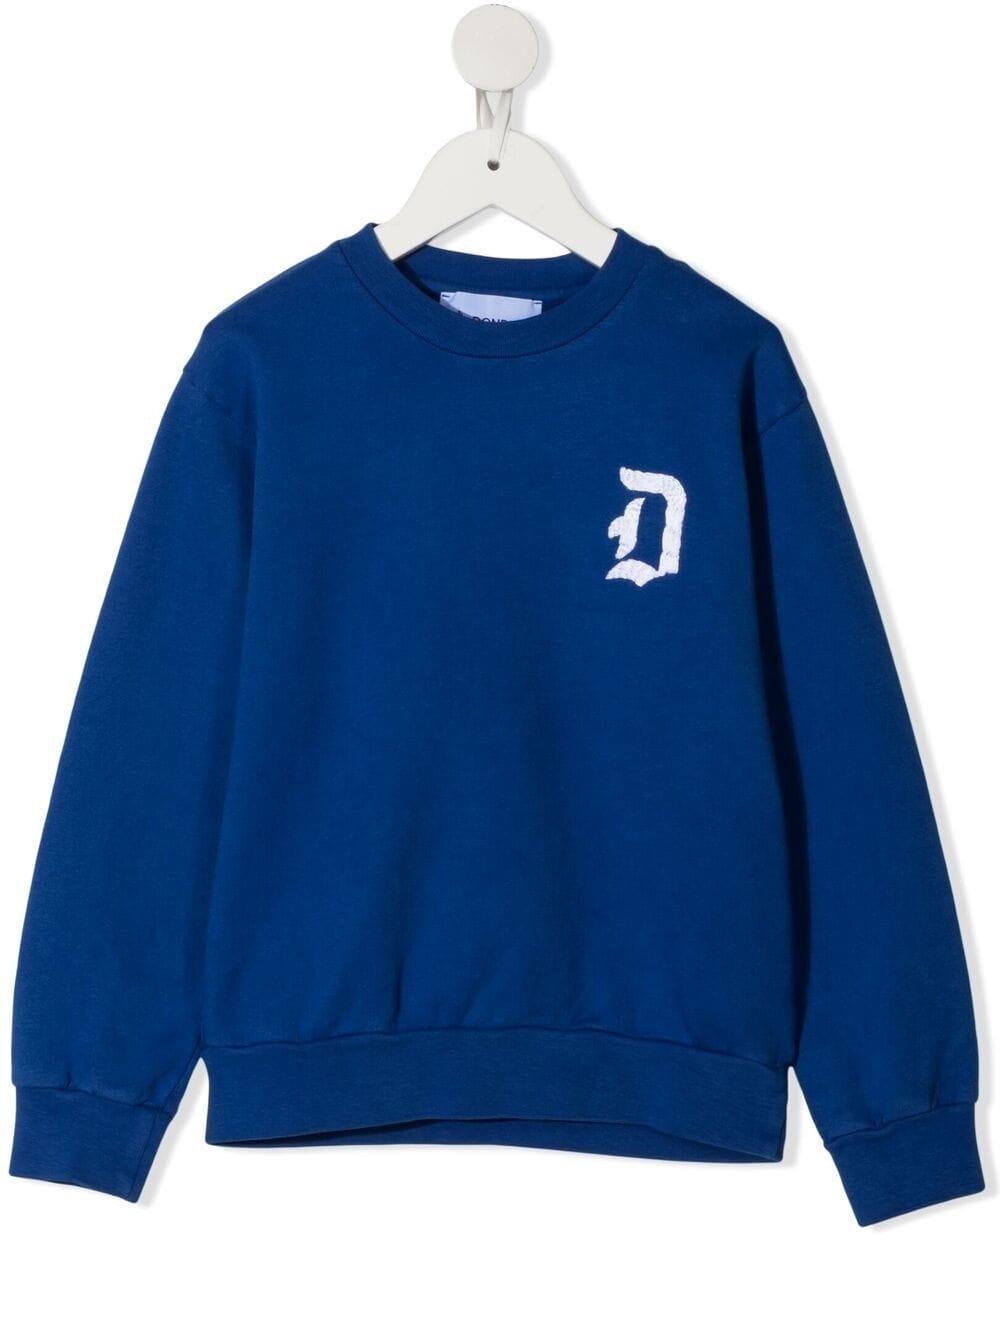 DONDUP | Sweatshirt | DMFE52FE144WD0234026